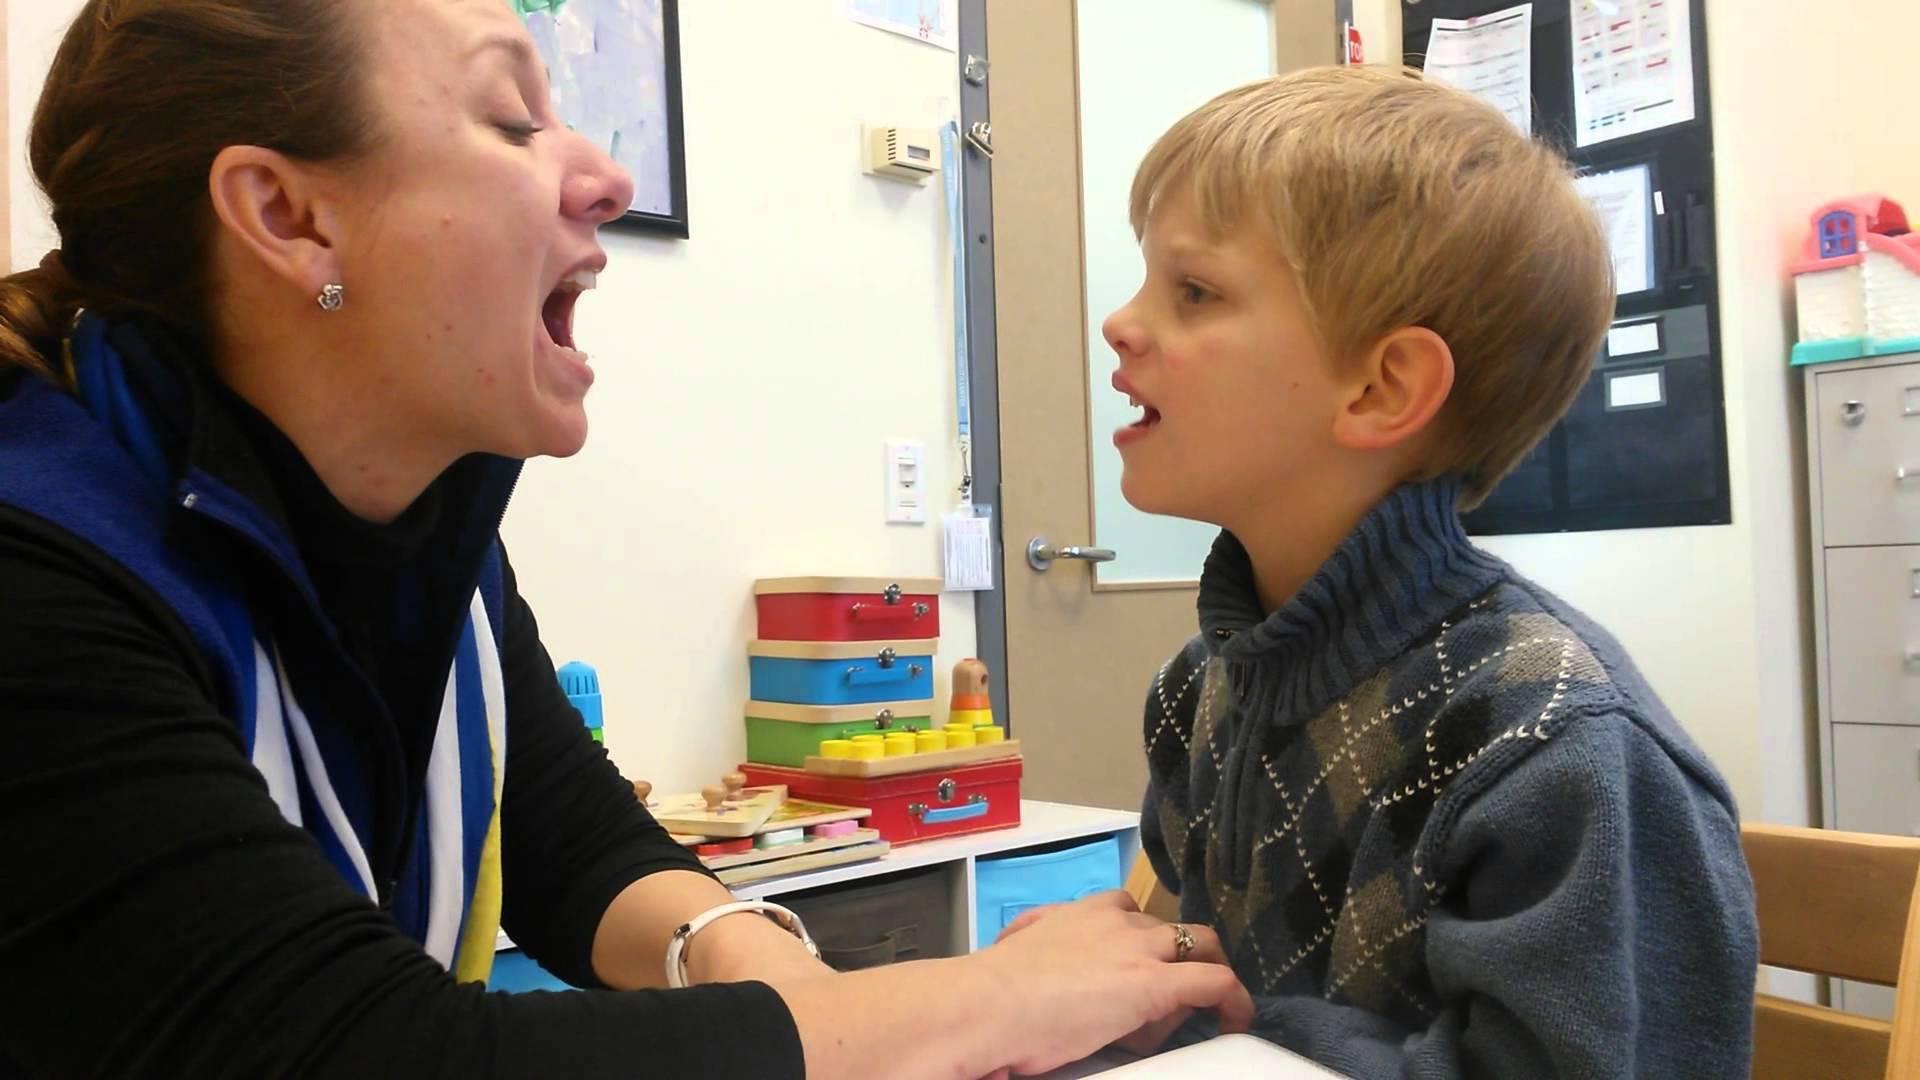 Speech apraxia, articulation, Kids speak, animated language learning